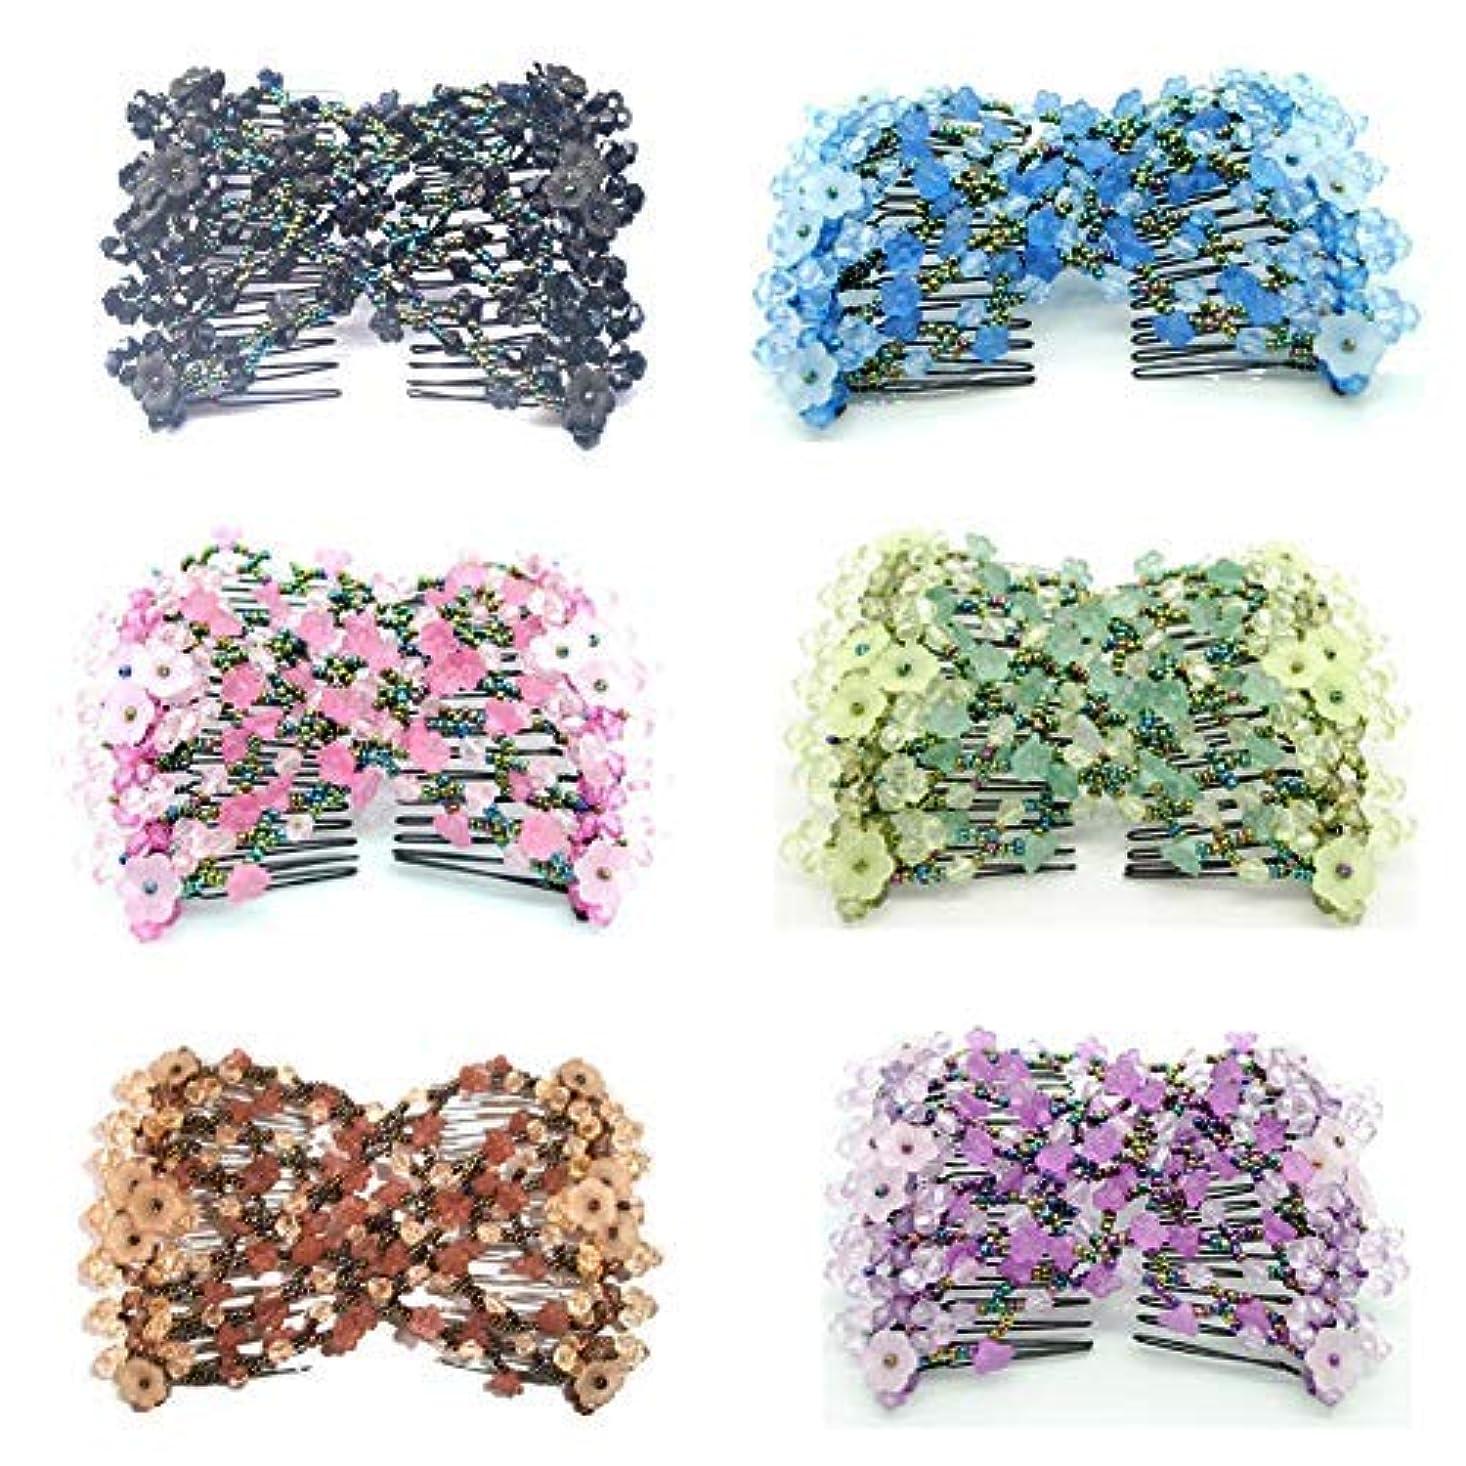 Casualfashion 6Pcs Magic Ez Combs for Women Hair Bun Maker Accessories, Elastic Beaded Double Hair Clips Combs...